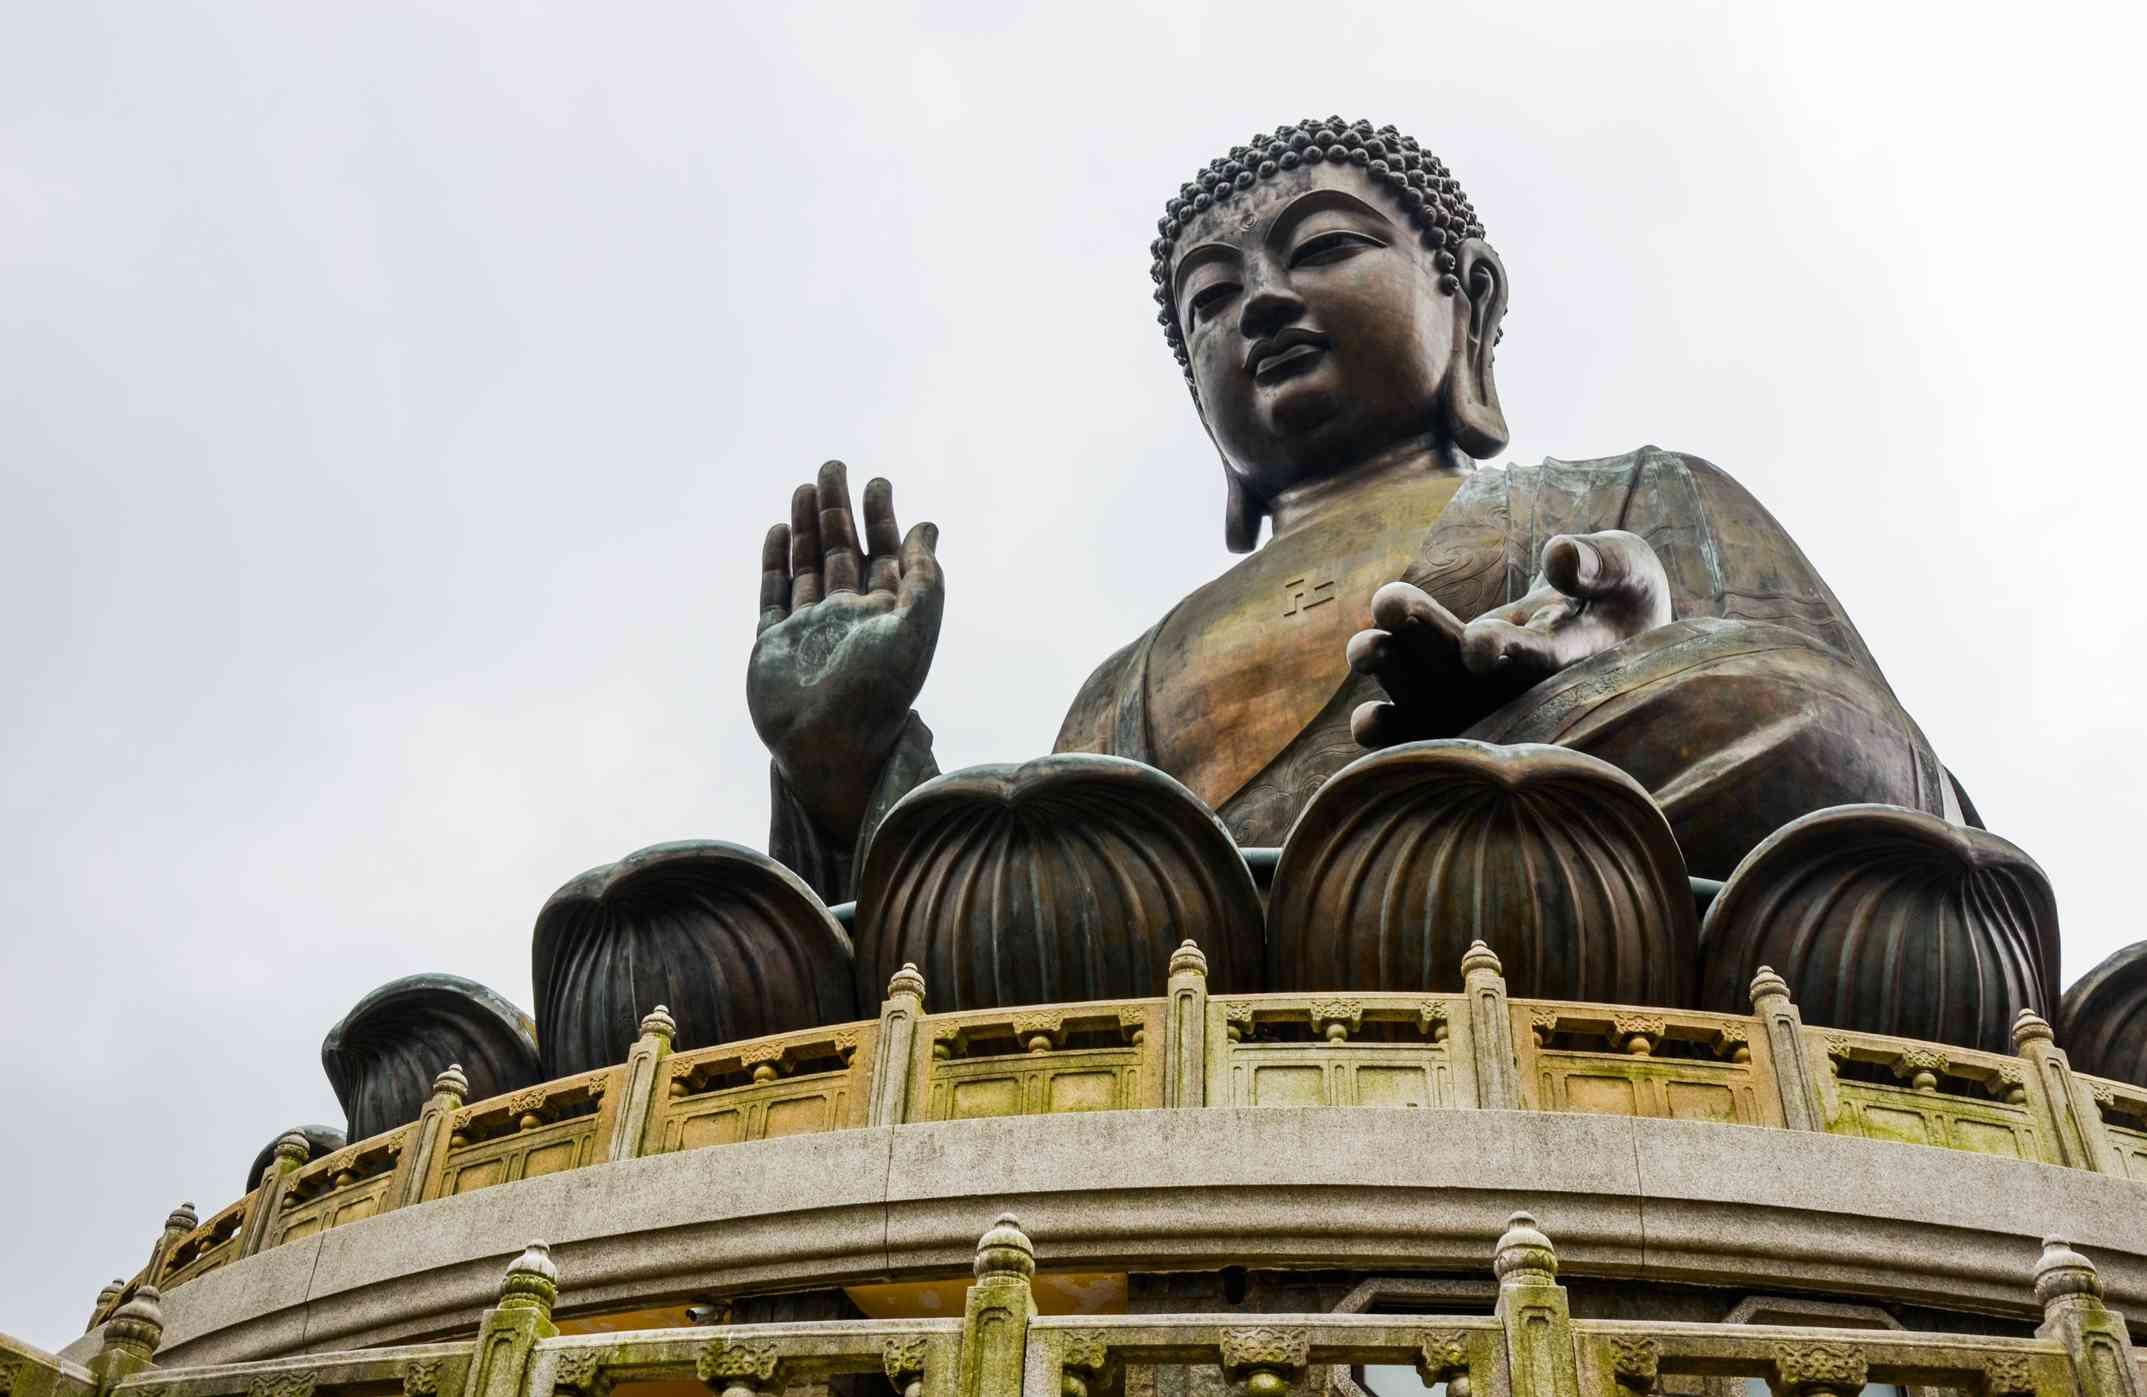 Buddha statue on a lotus flower